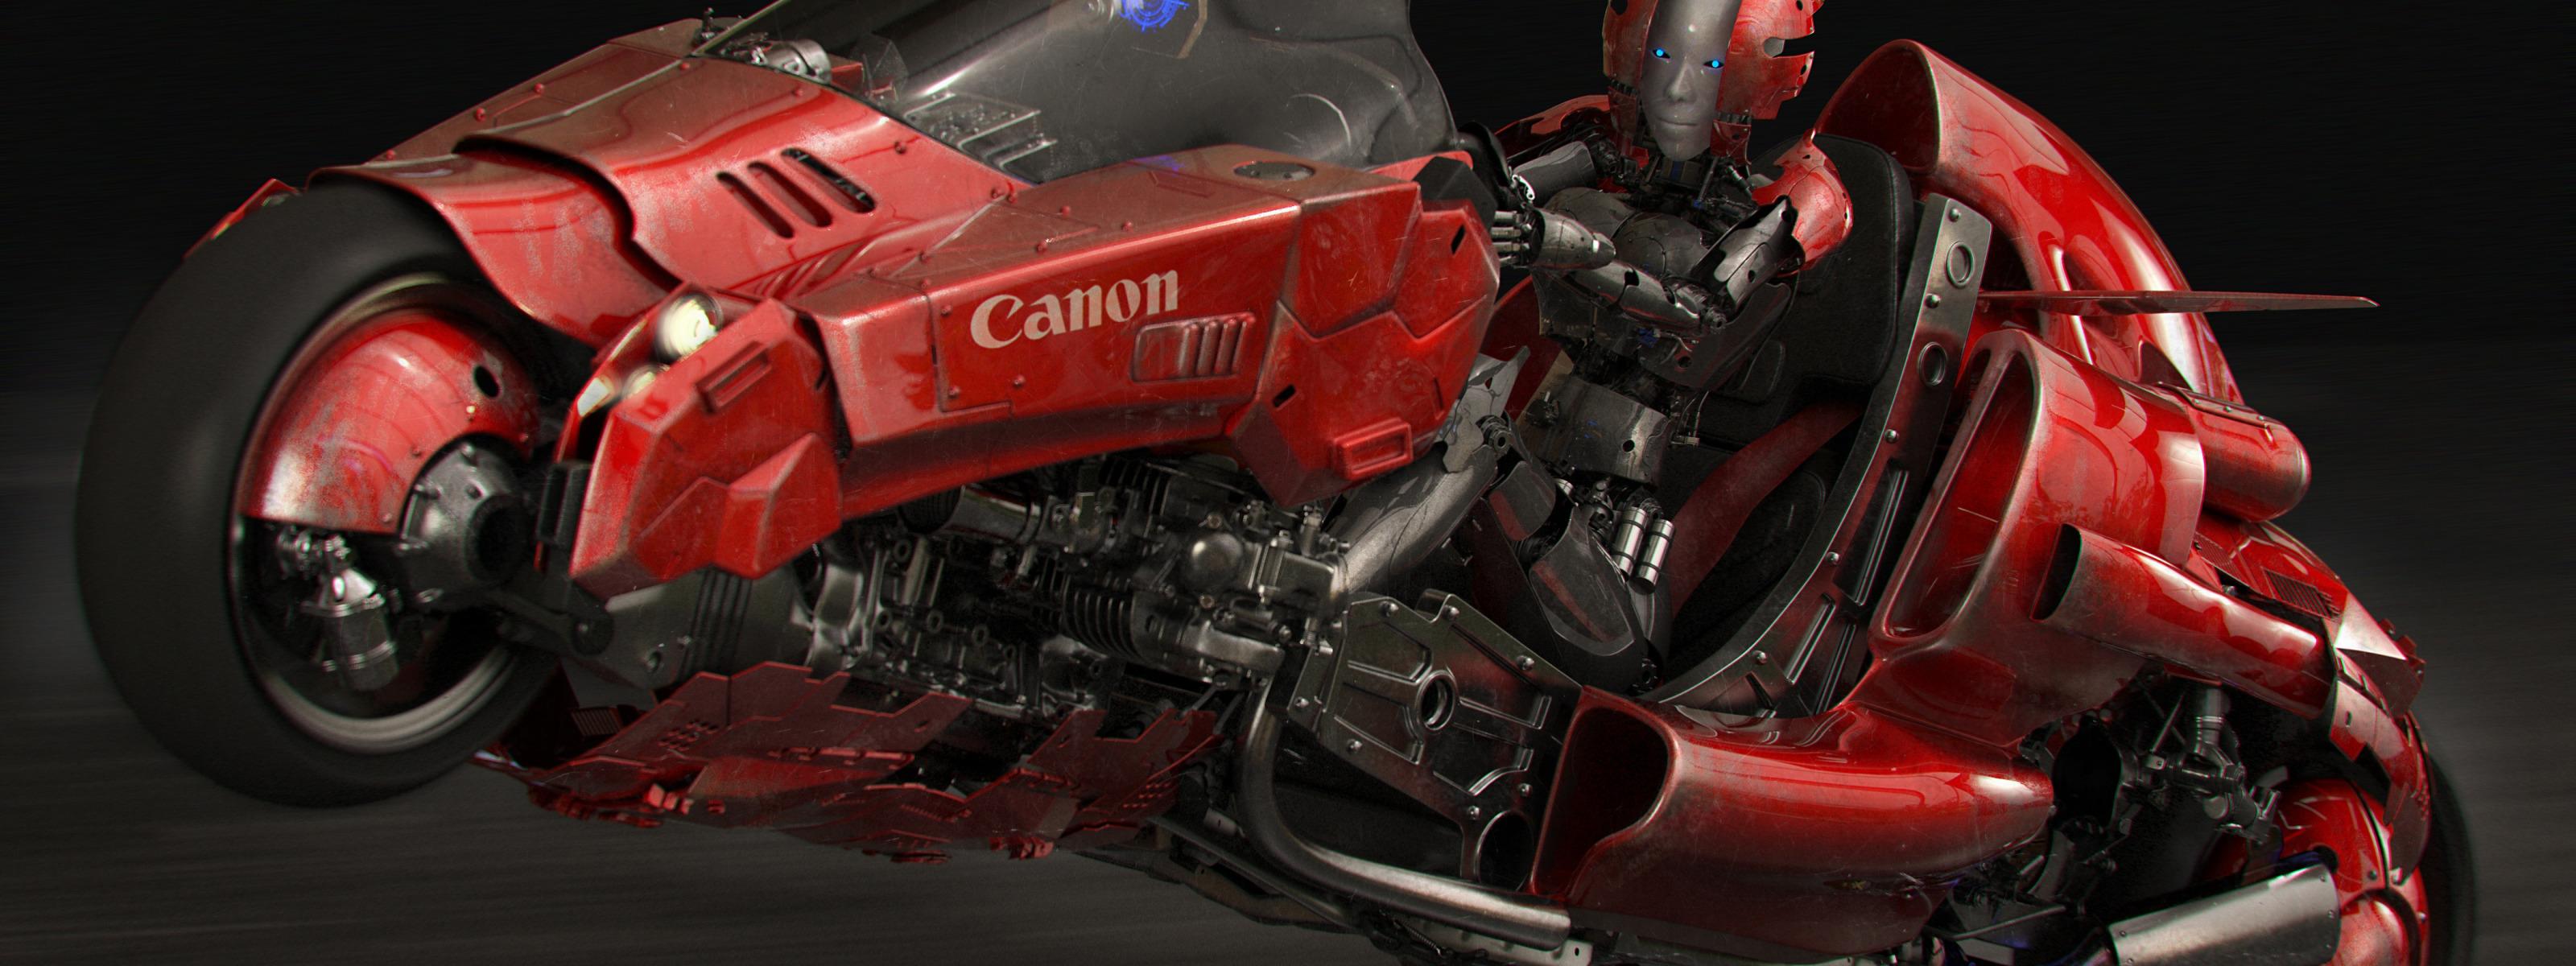 родители робот на мотоцикле картинки студента, проходившего практику